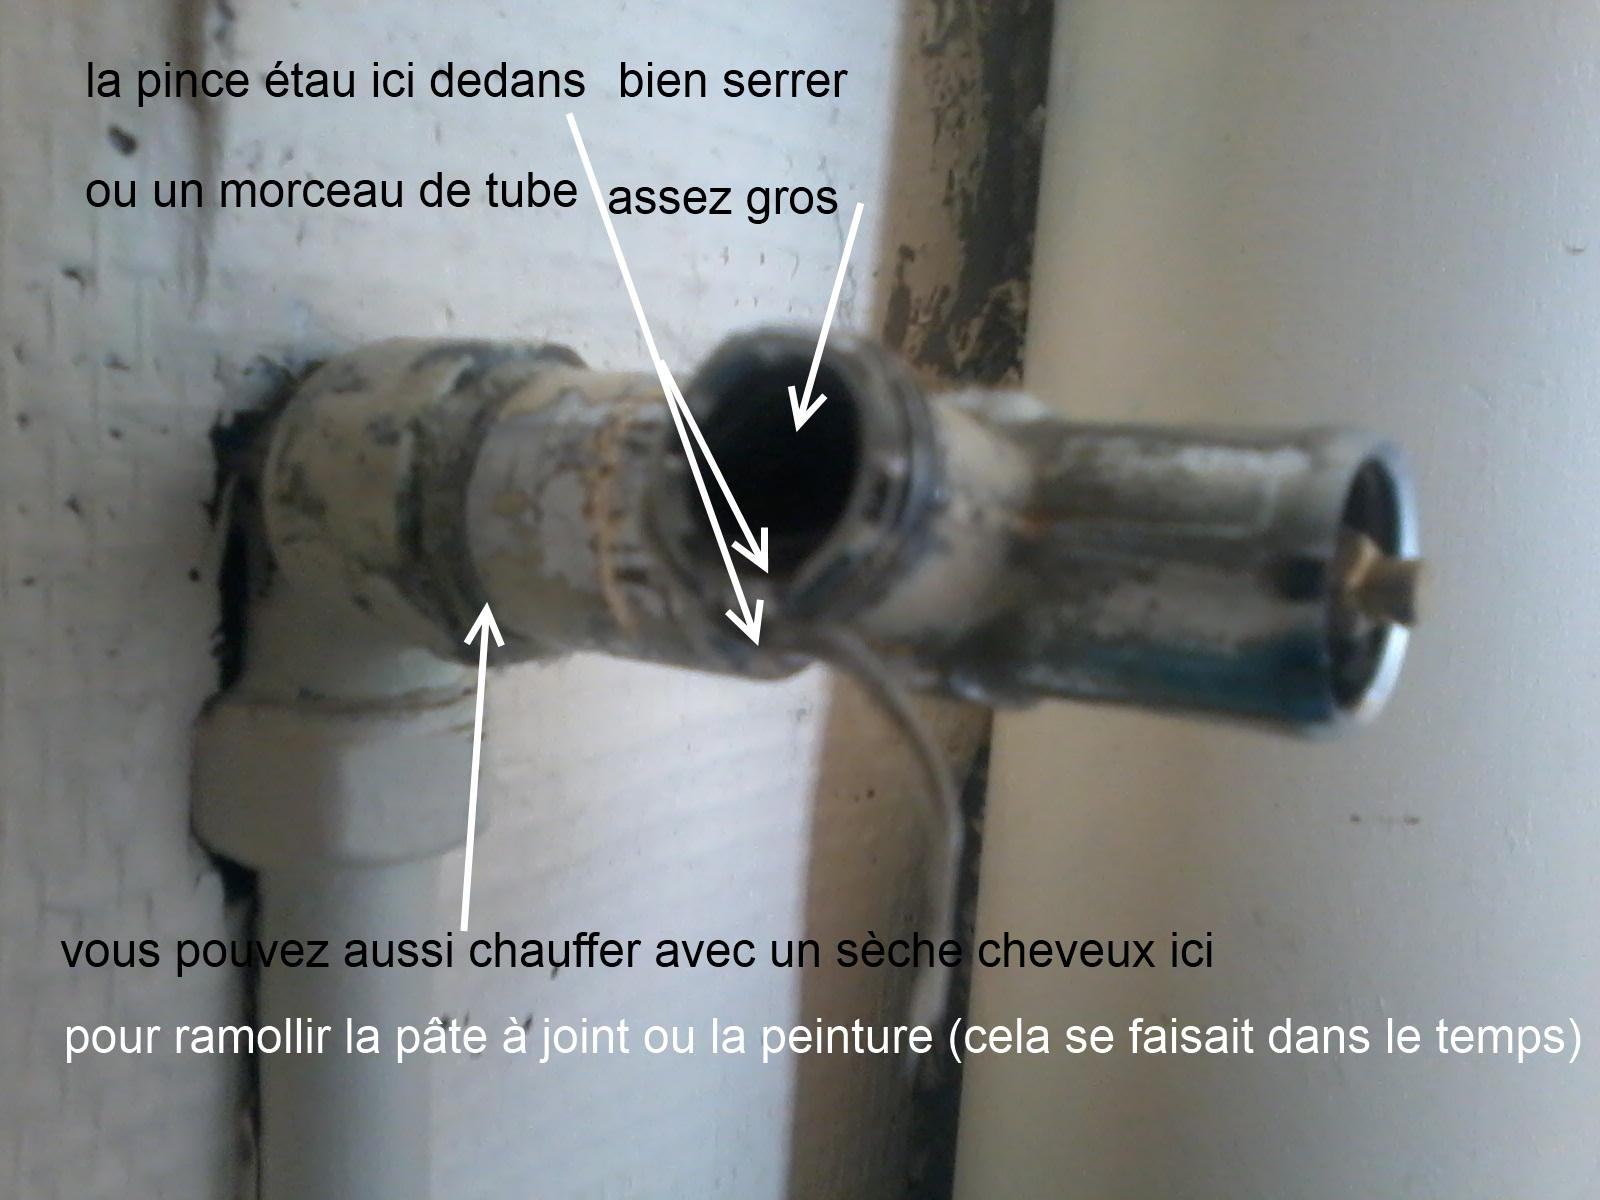 Sos comment d visser un robinet wc qui est compl tement bloqu - Comment devisser un robinet grippe ...